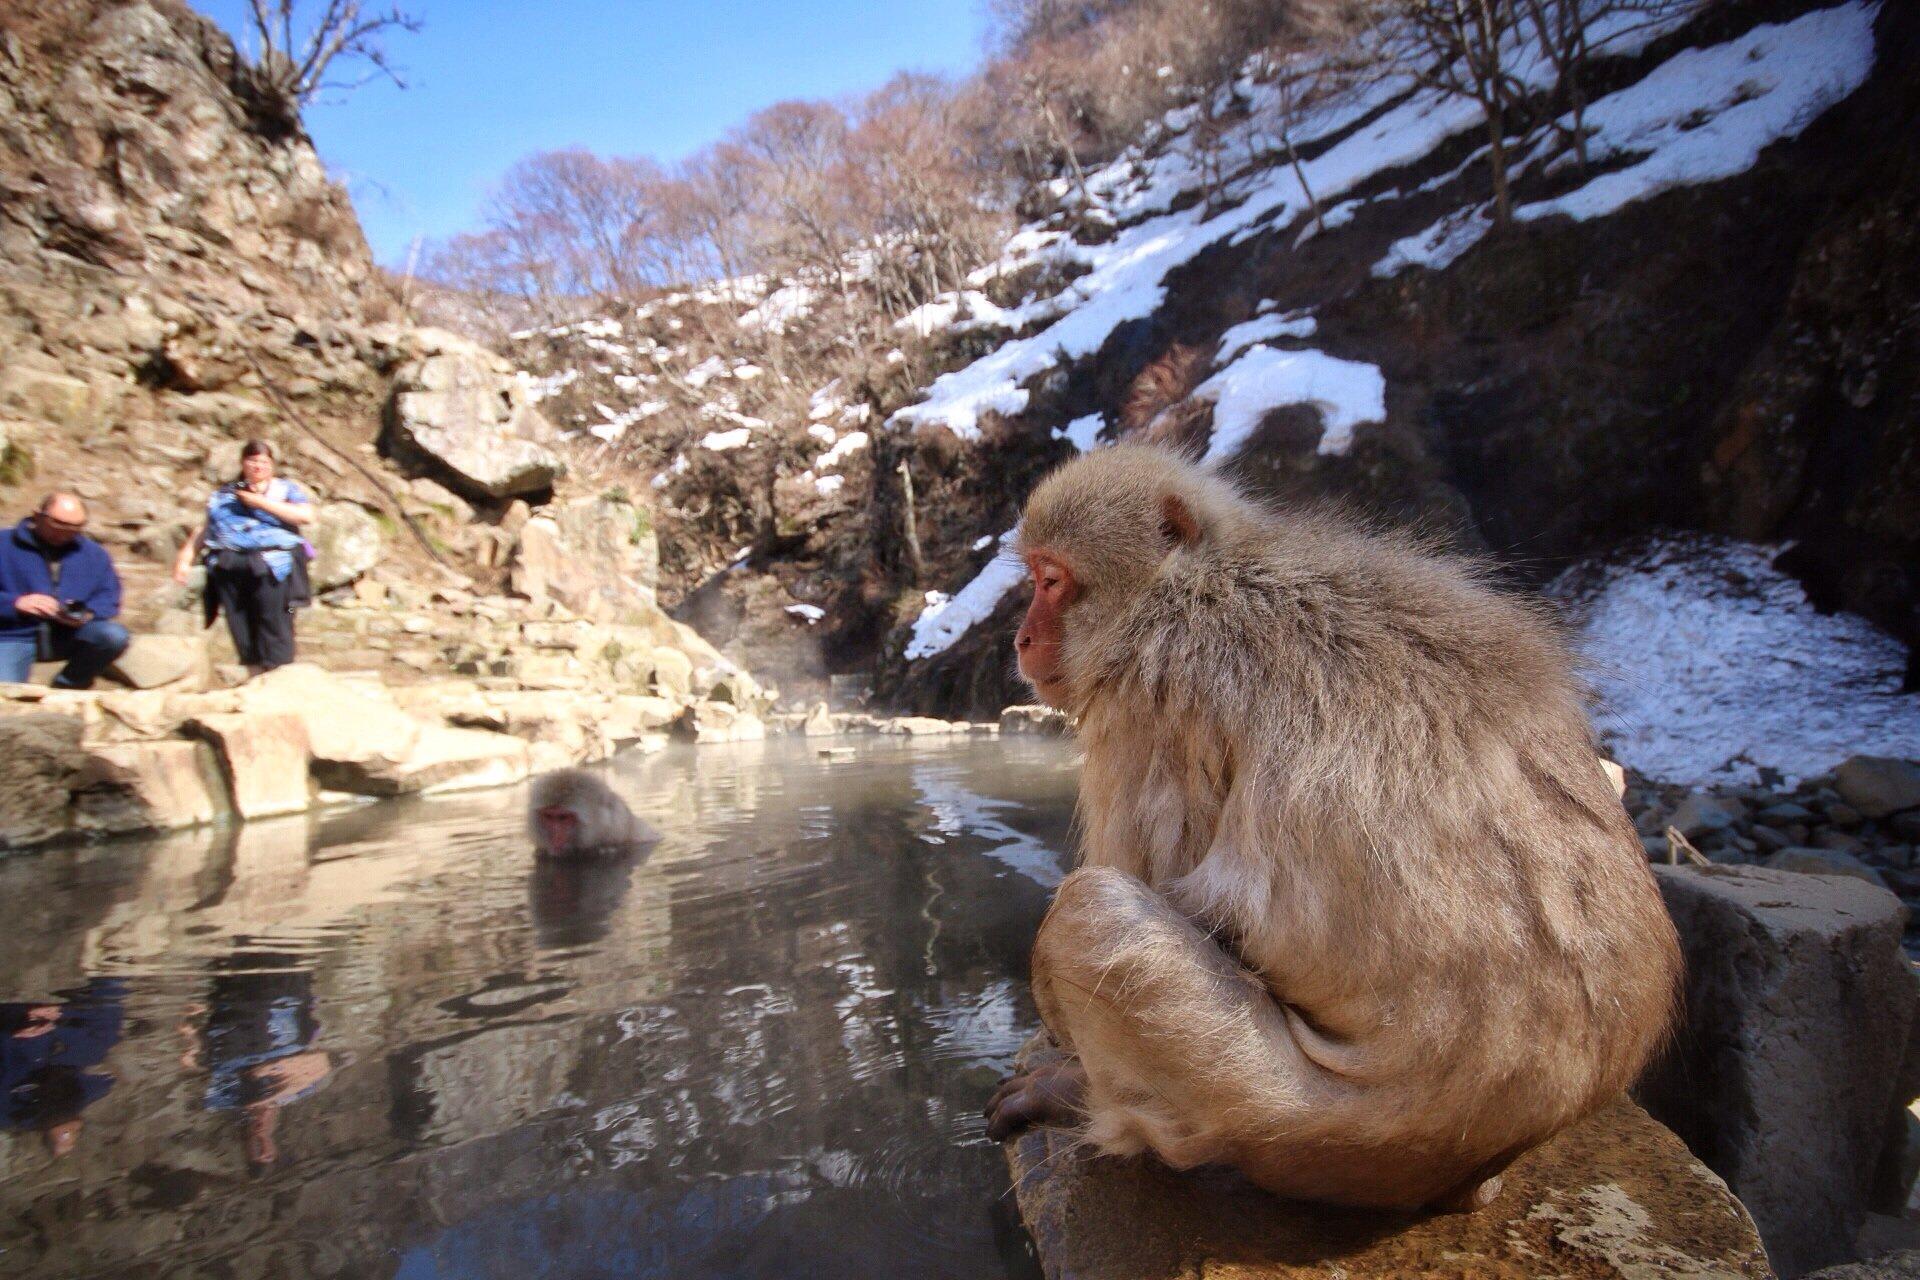 snow-monkeys-3-kasuma-photo-blog